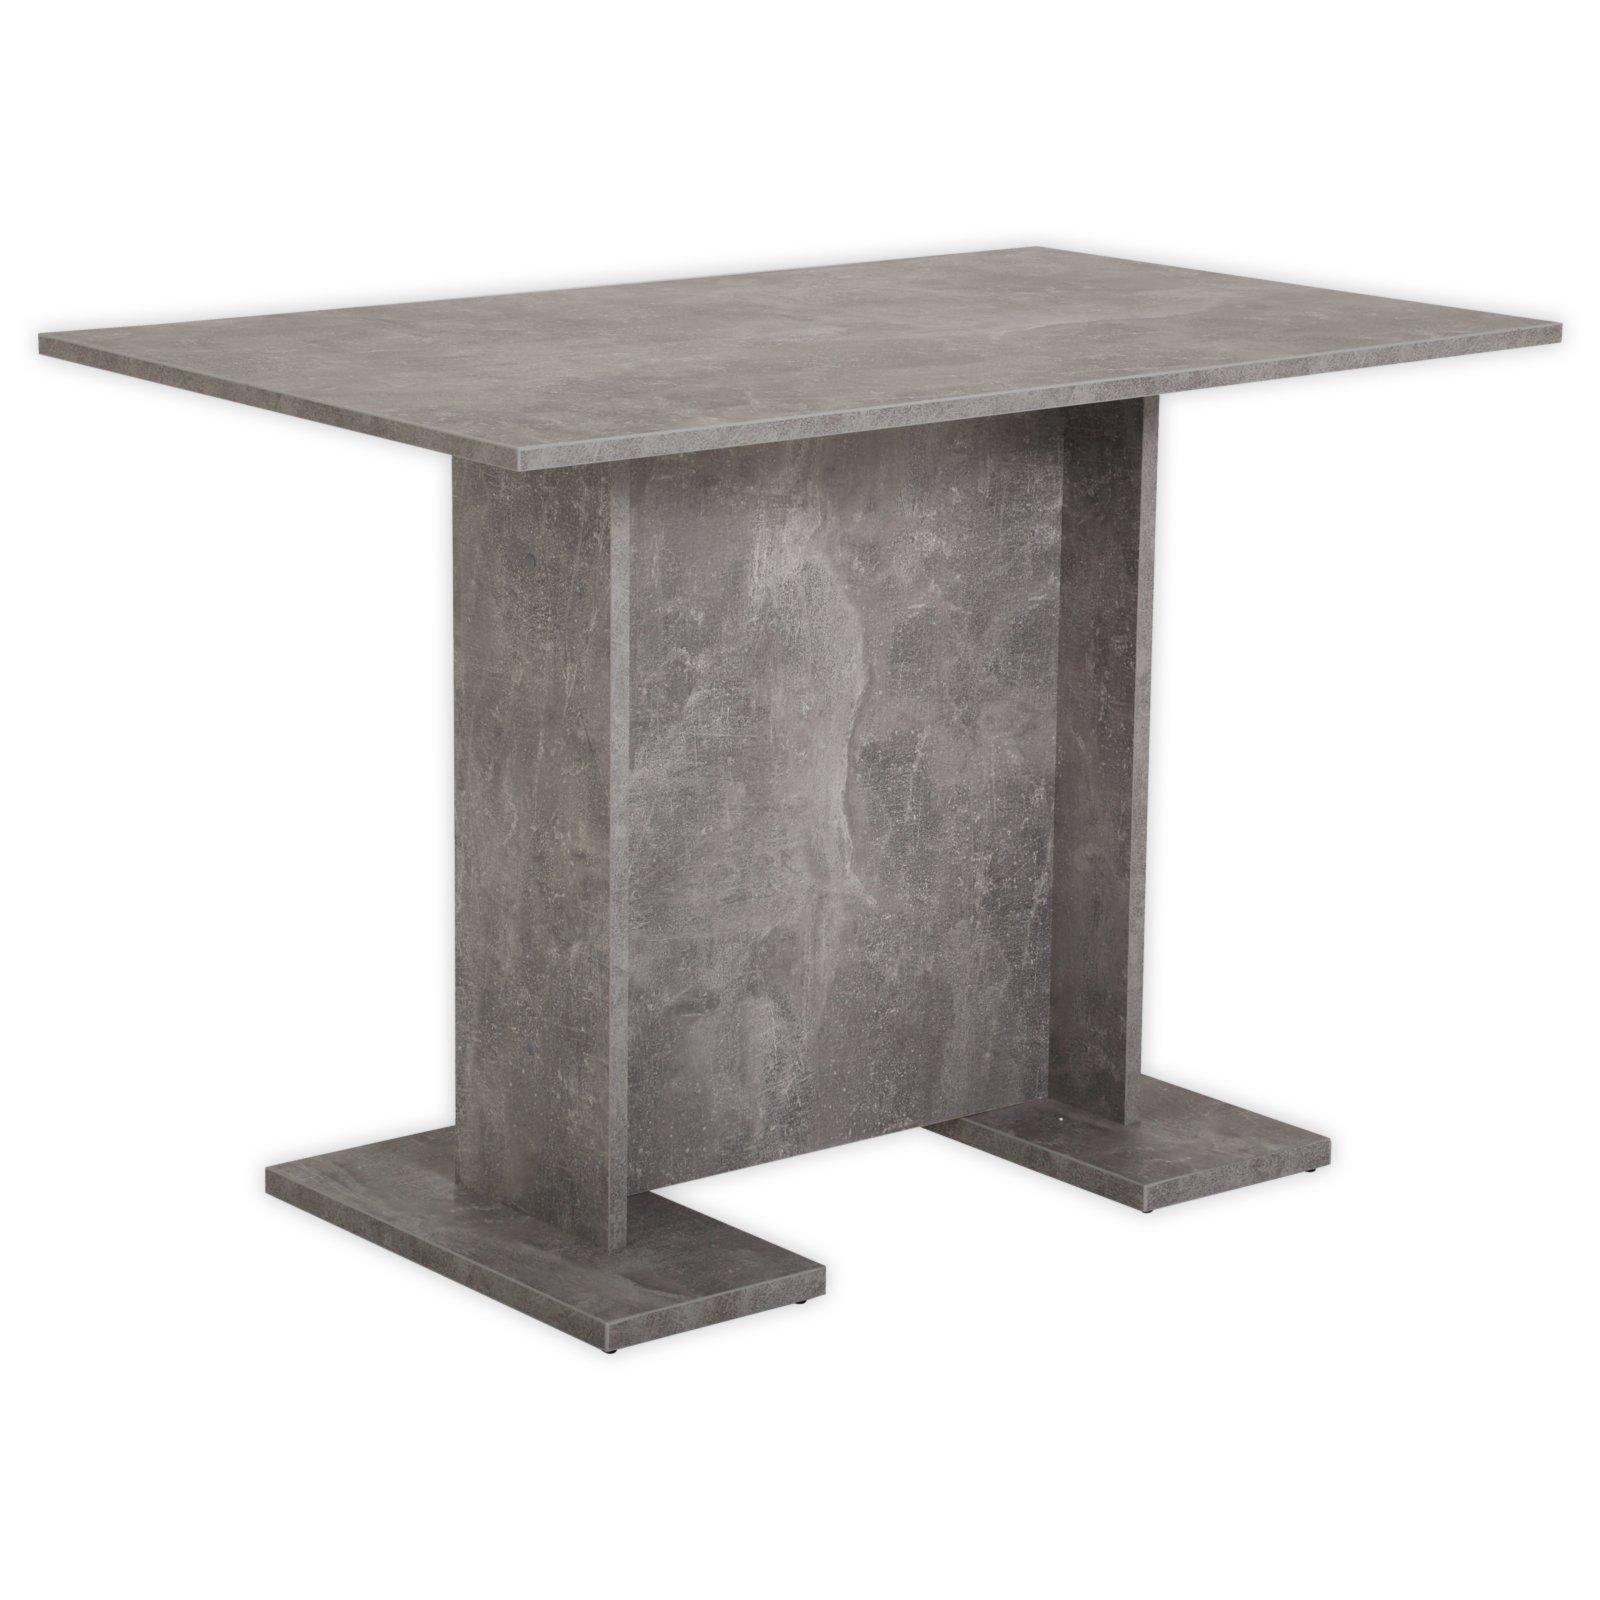 esstisch ines iii betonoptik 108 cm breit esstische sitzen essen esszimmer. Black Bedroom Furniture Sets. Home Design Ideas